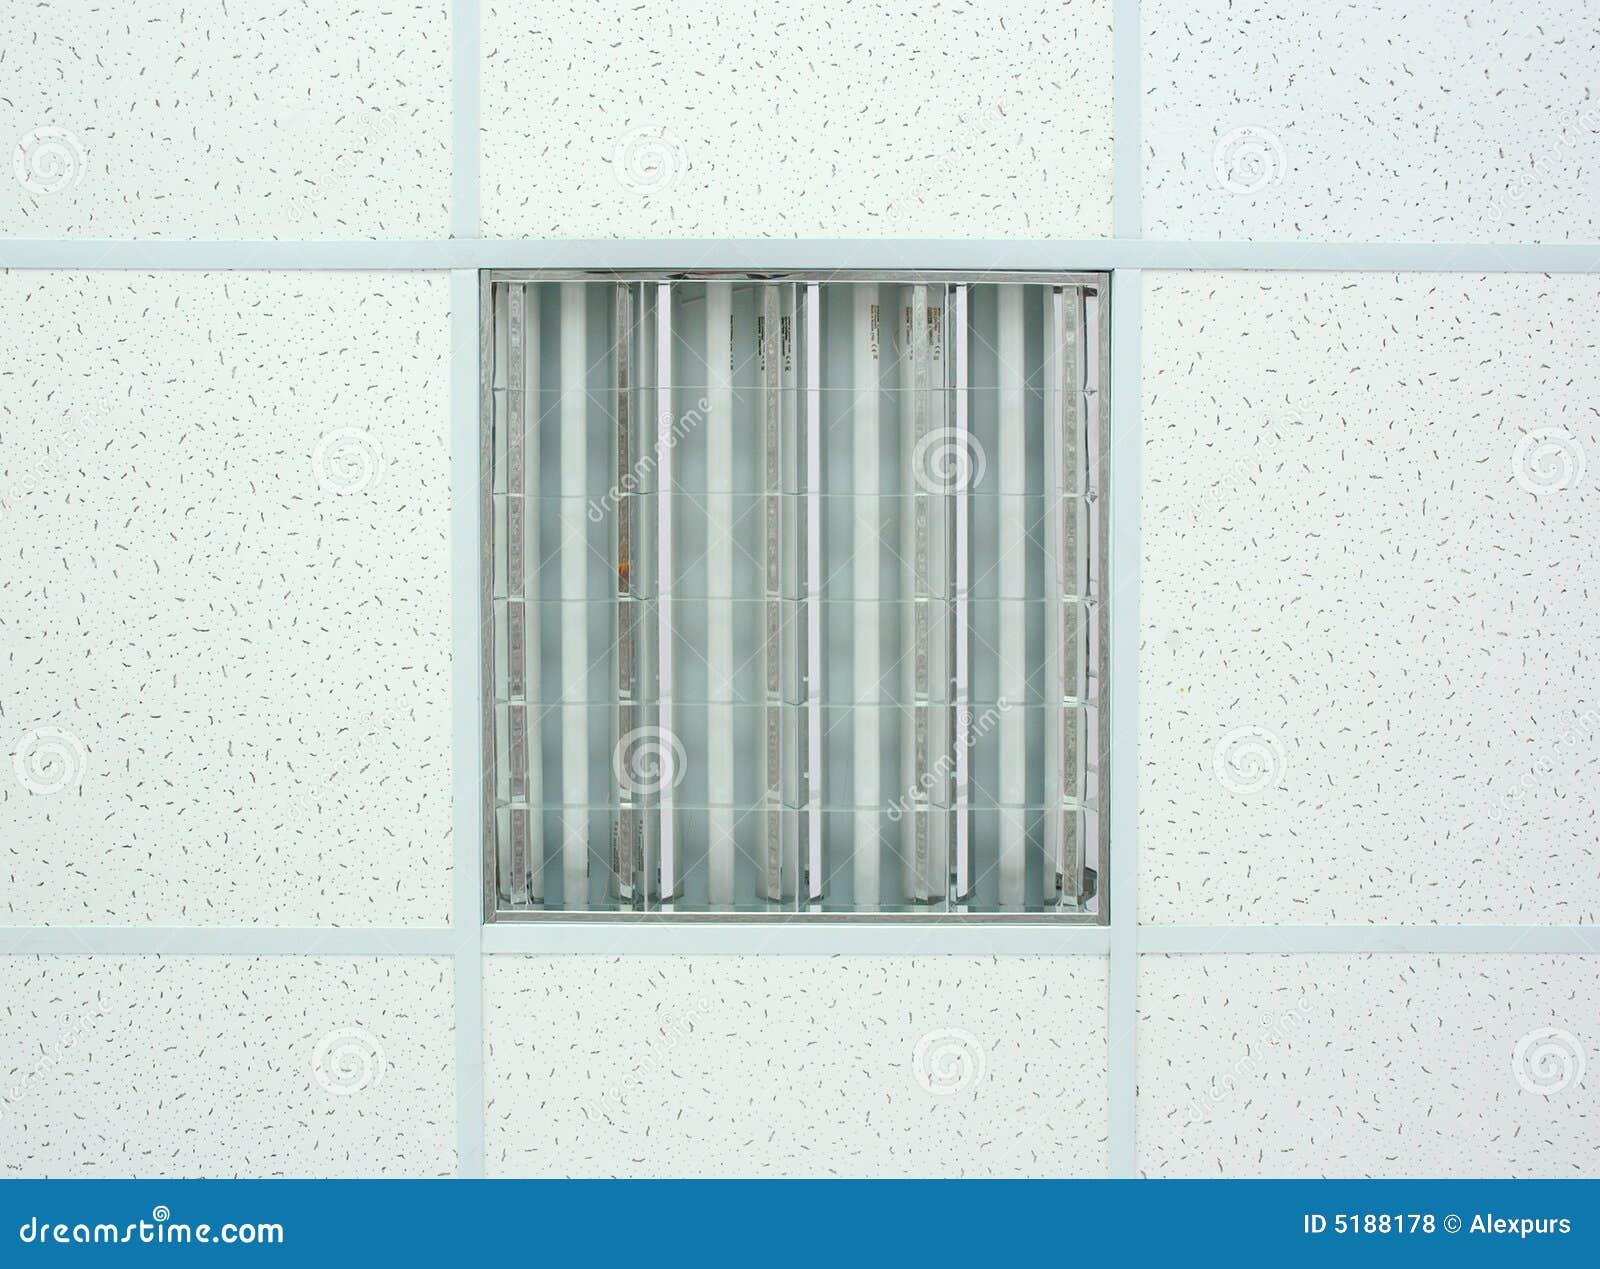 Hanging White Ceiling. Royalty Free Stock Photos - Image: 5188178